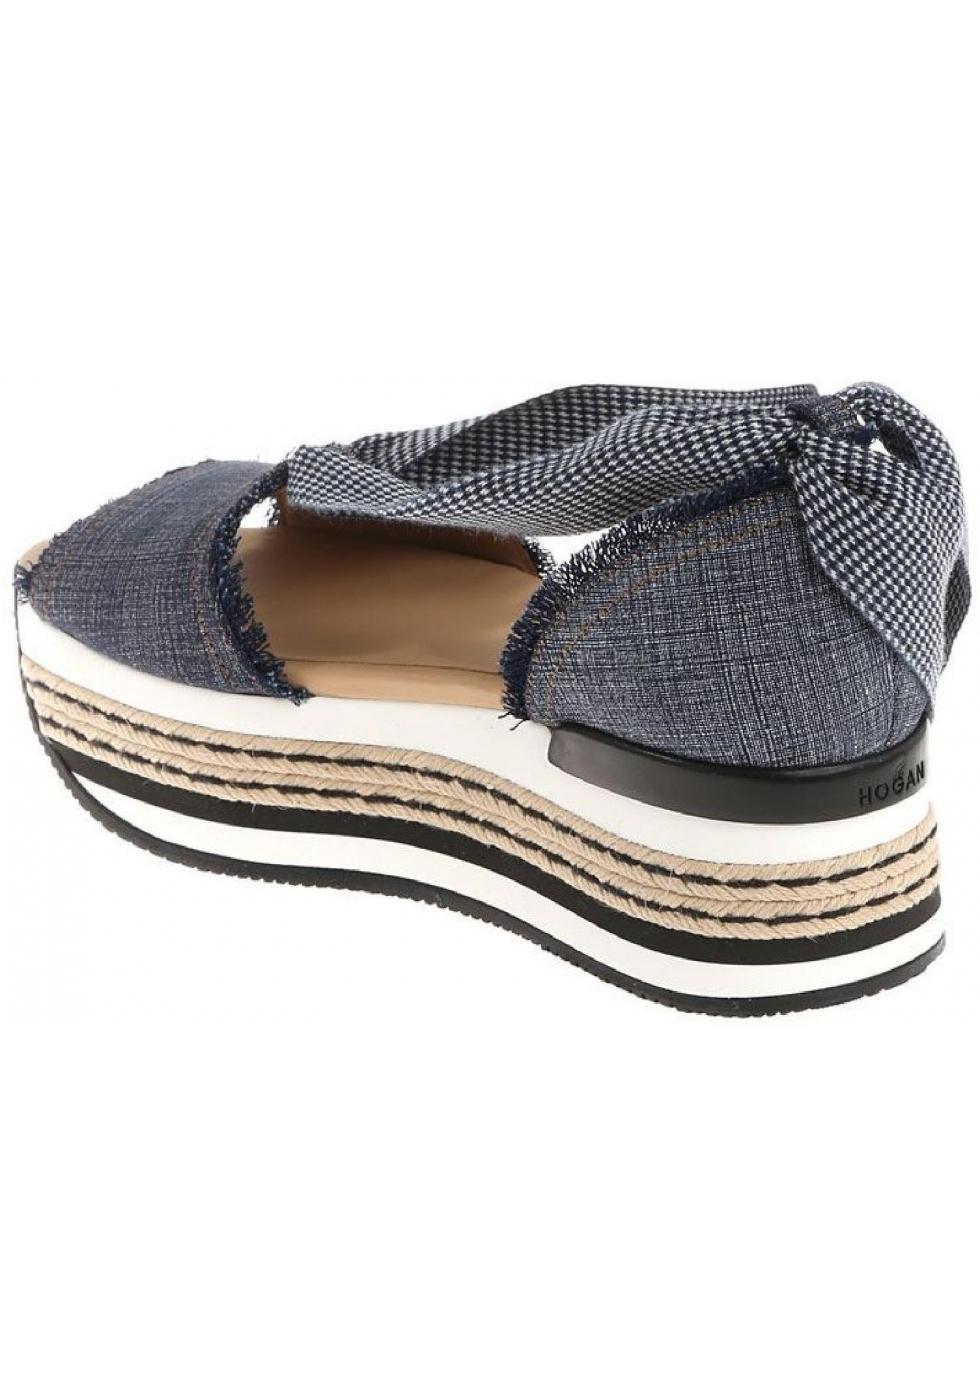 d63bebc5c6 Sandali tacco alto Hogan donna in tela Jeans - Italian Boutique